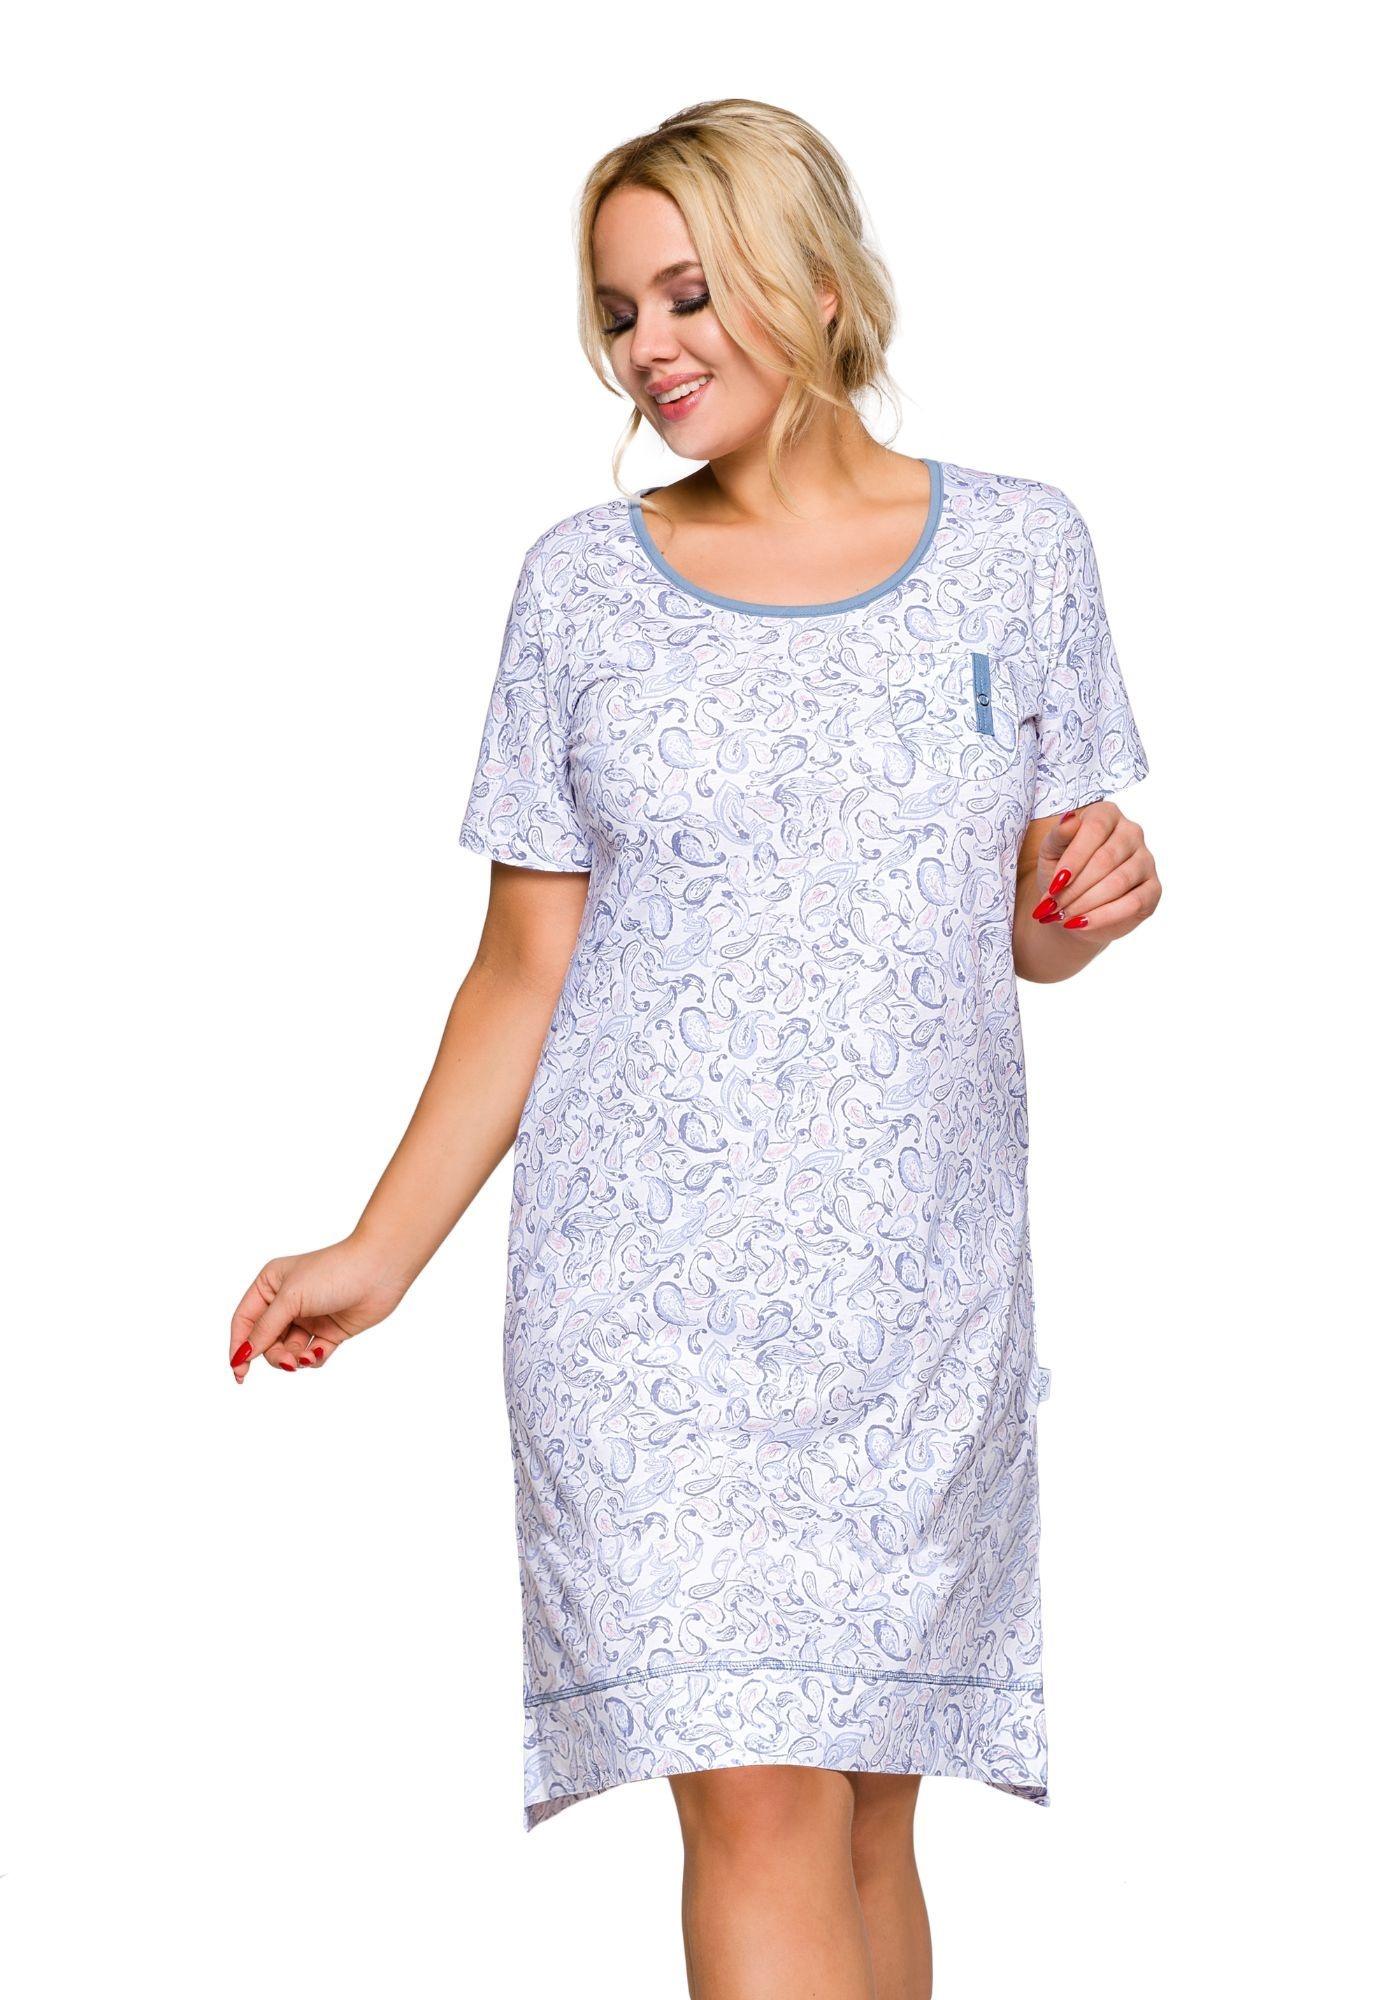 47f228907b46 Dámska nočná košeľa Mela modrá Dámska nočná košeľa Mela modrá